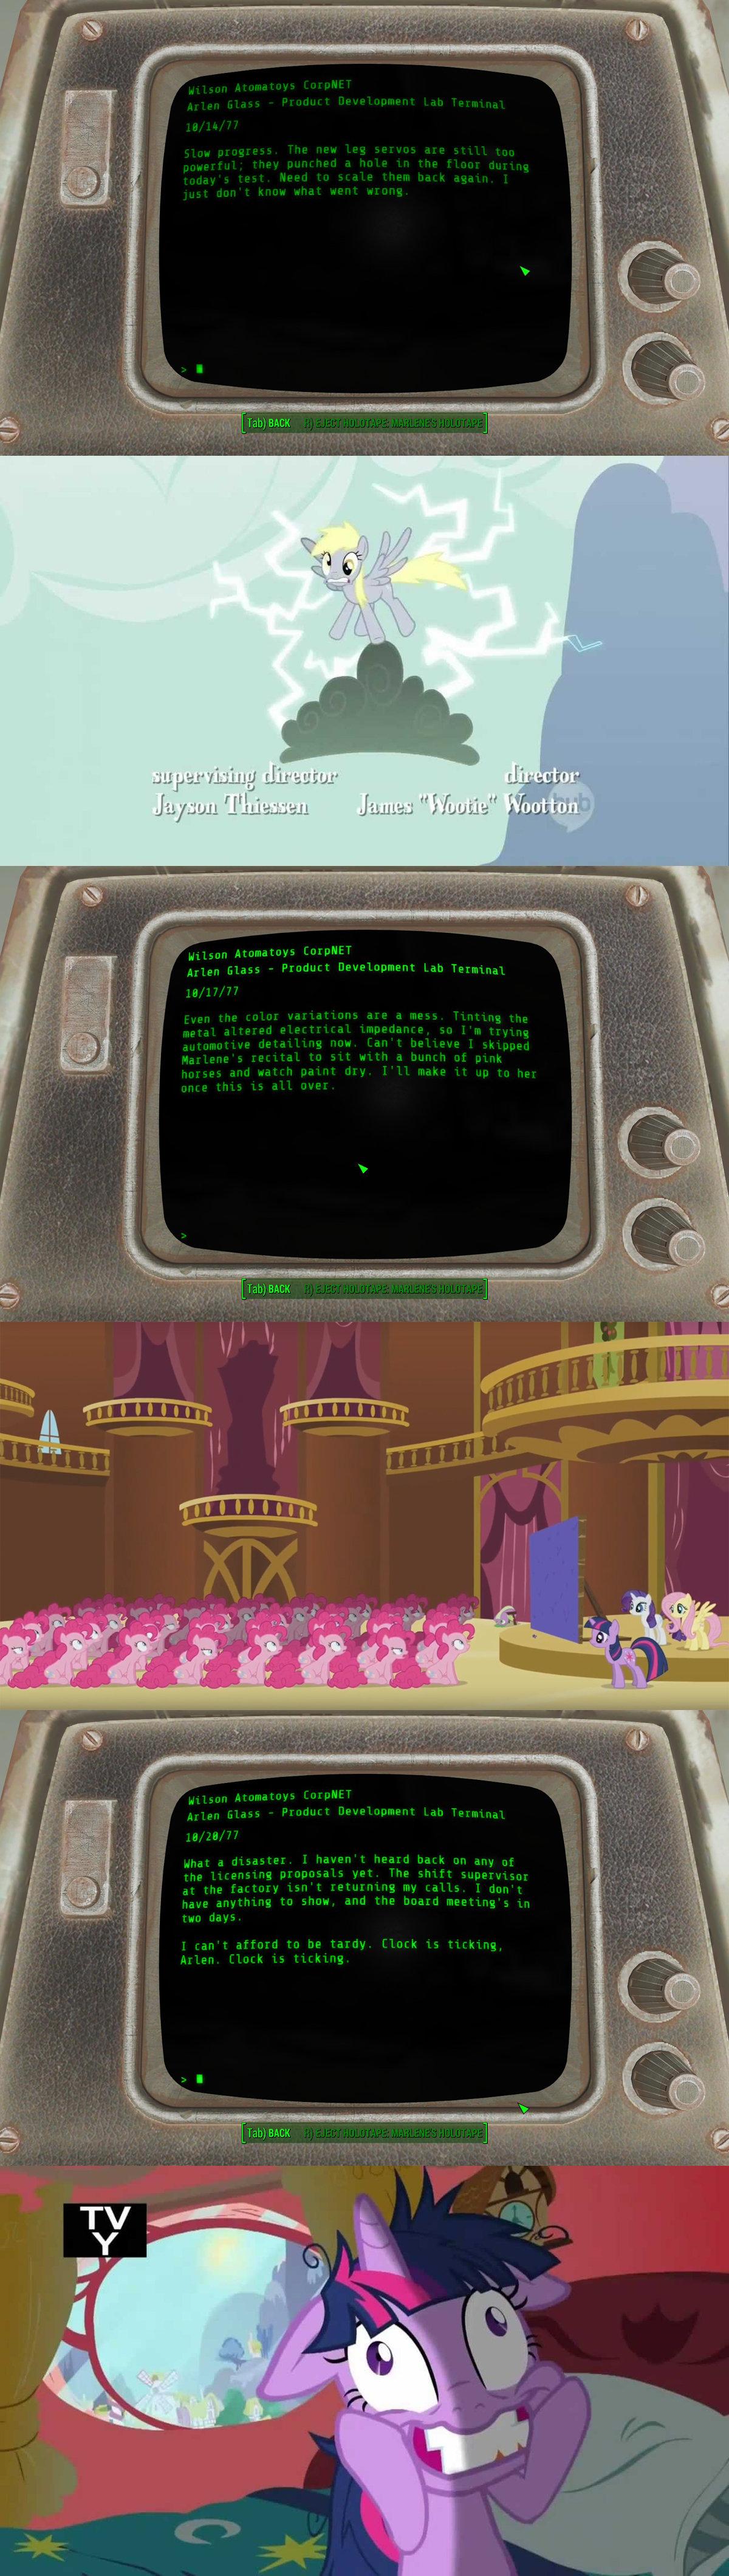 fallout pony references